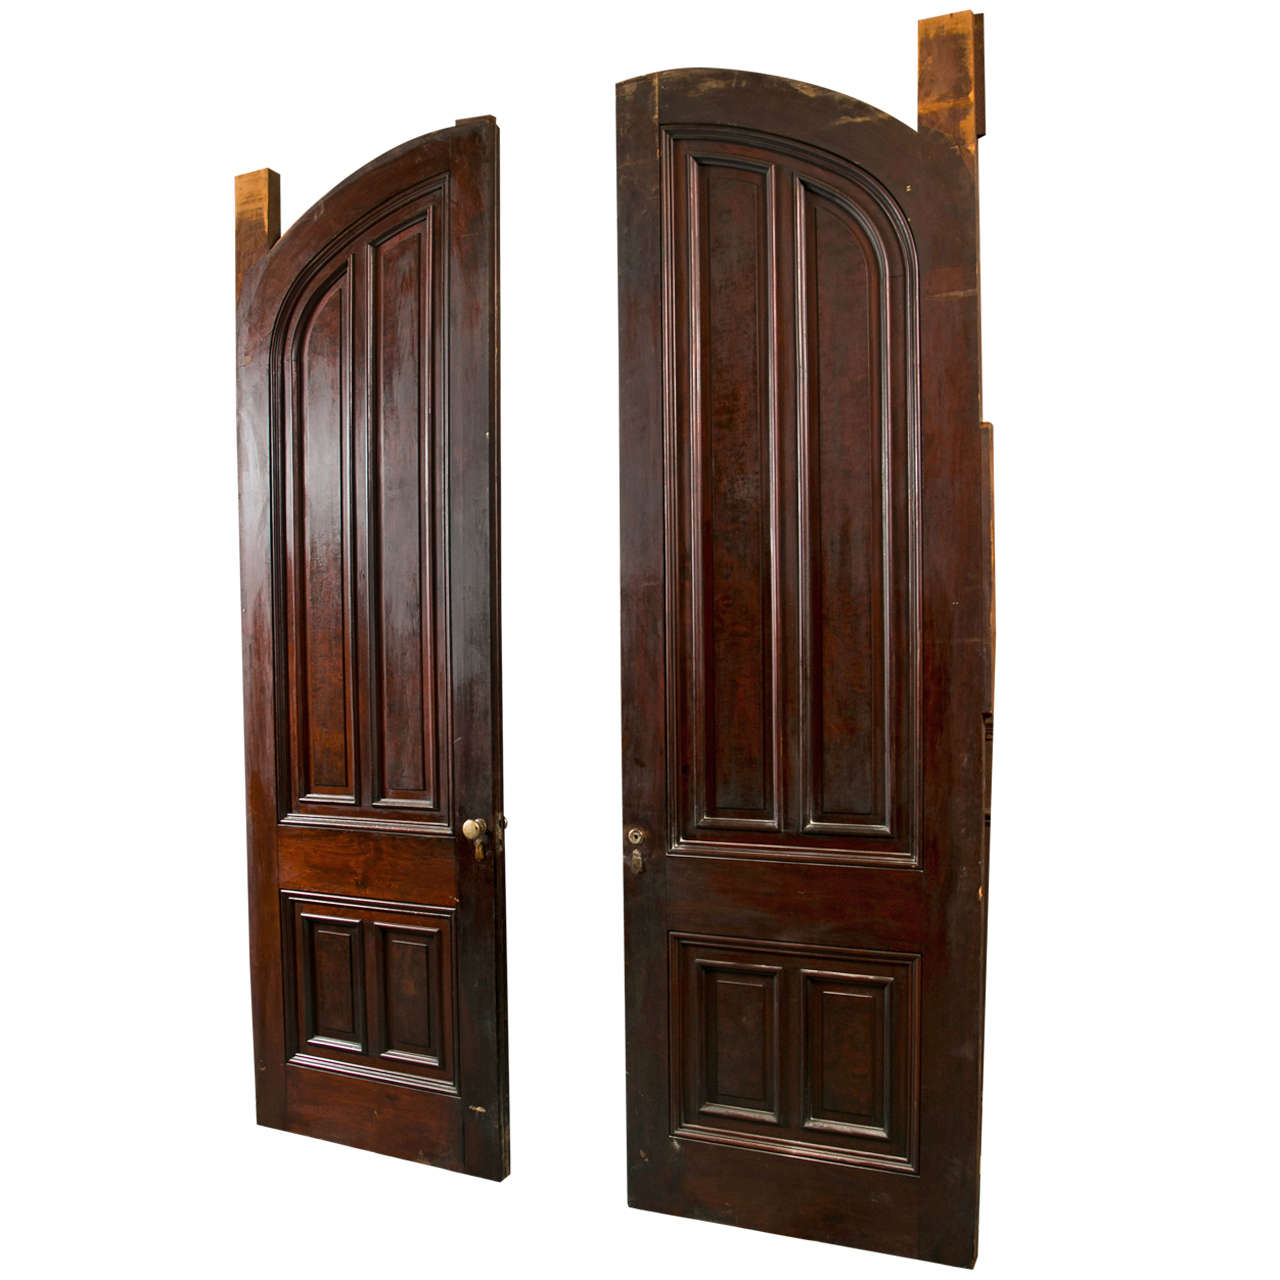 Antique Walnut Raised Panel Pocket Doors For Sale - Antique Walnut Raised Panel Pocket Doors At 1stdibs